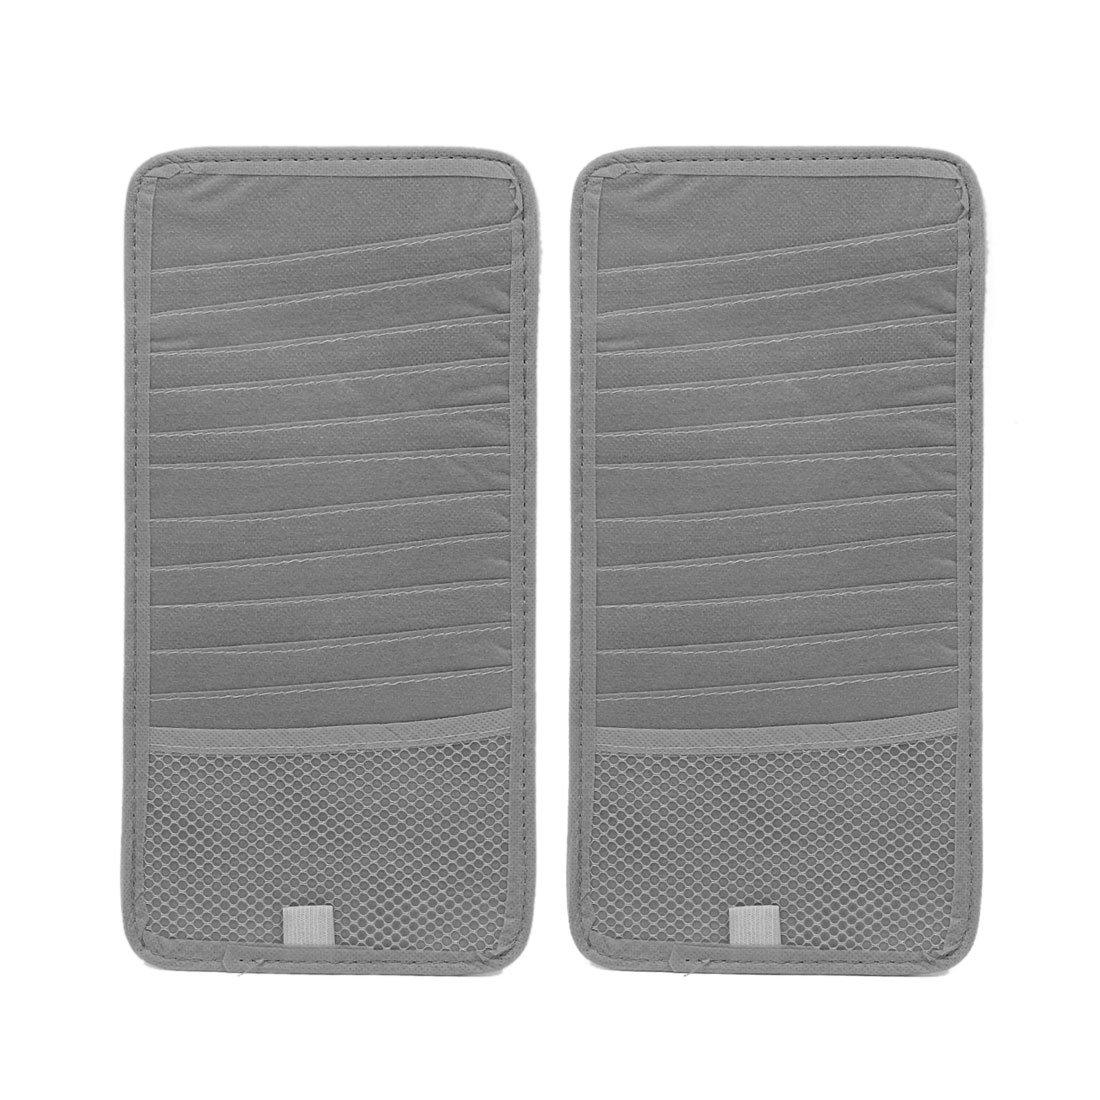 uxcell 2Pcs Gray Rectangle Shaped Car CD DVD Sun Visor Card Storage Organizer Holder